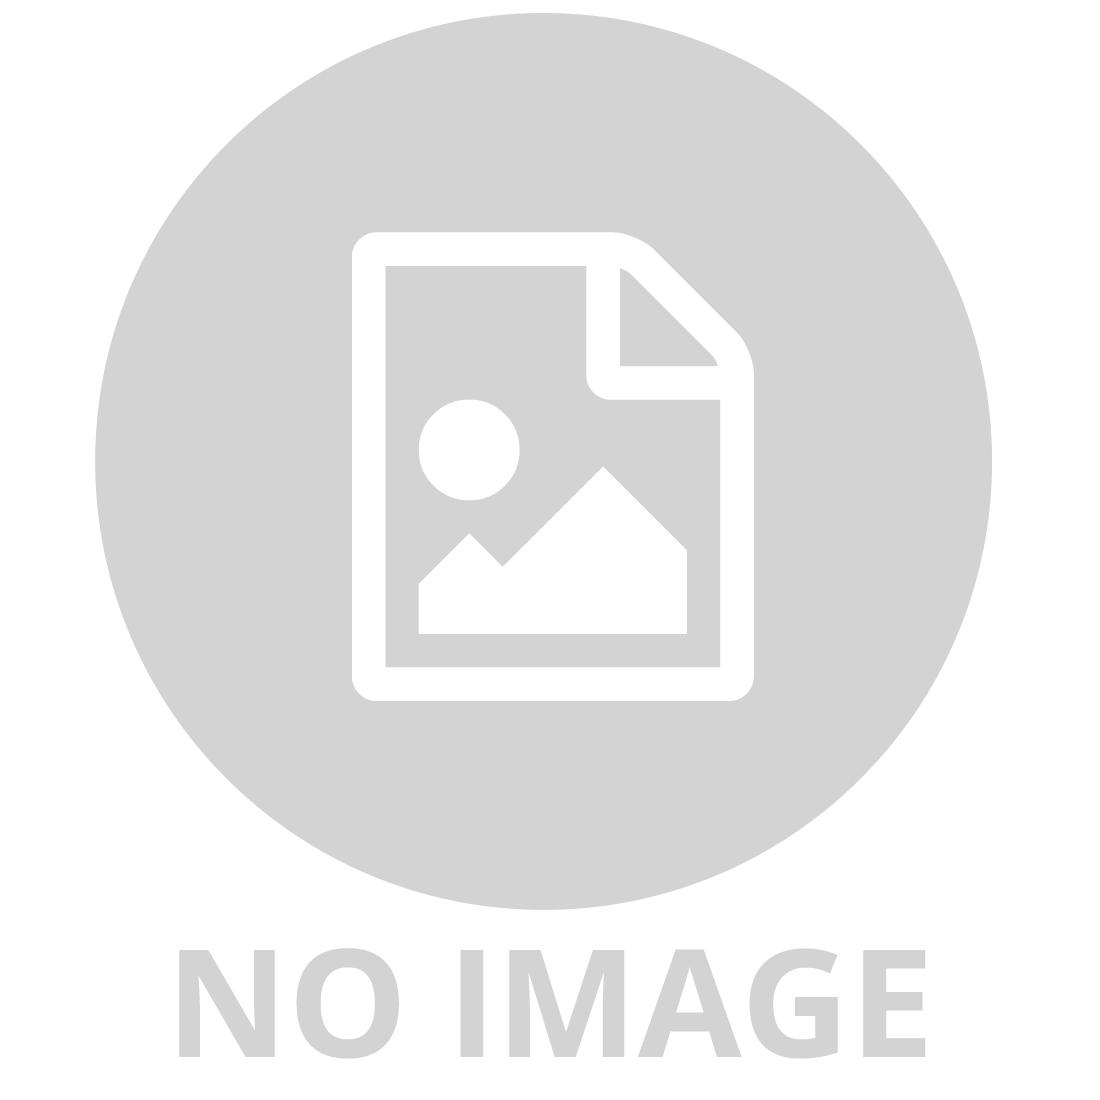 THUNDER HIGH SPEED 1/18 BLUE 4WD TRUCK RADIO CONTROL